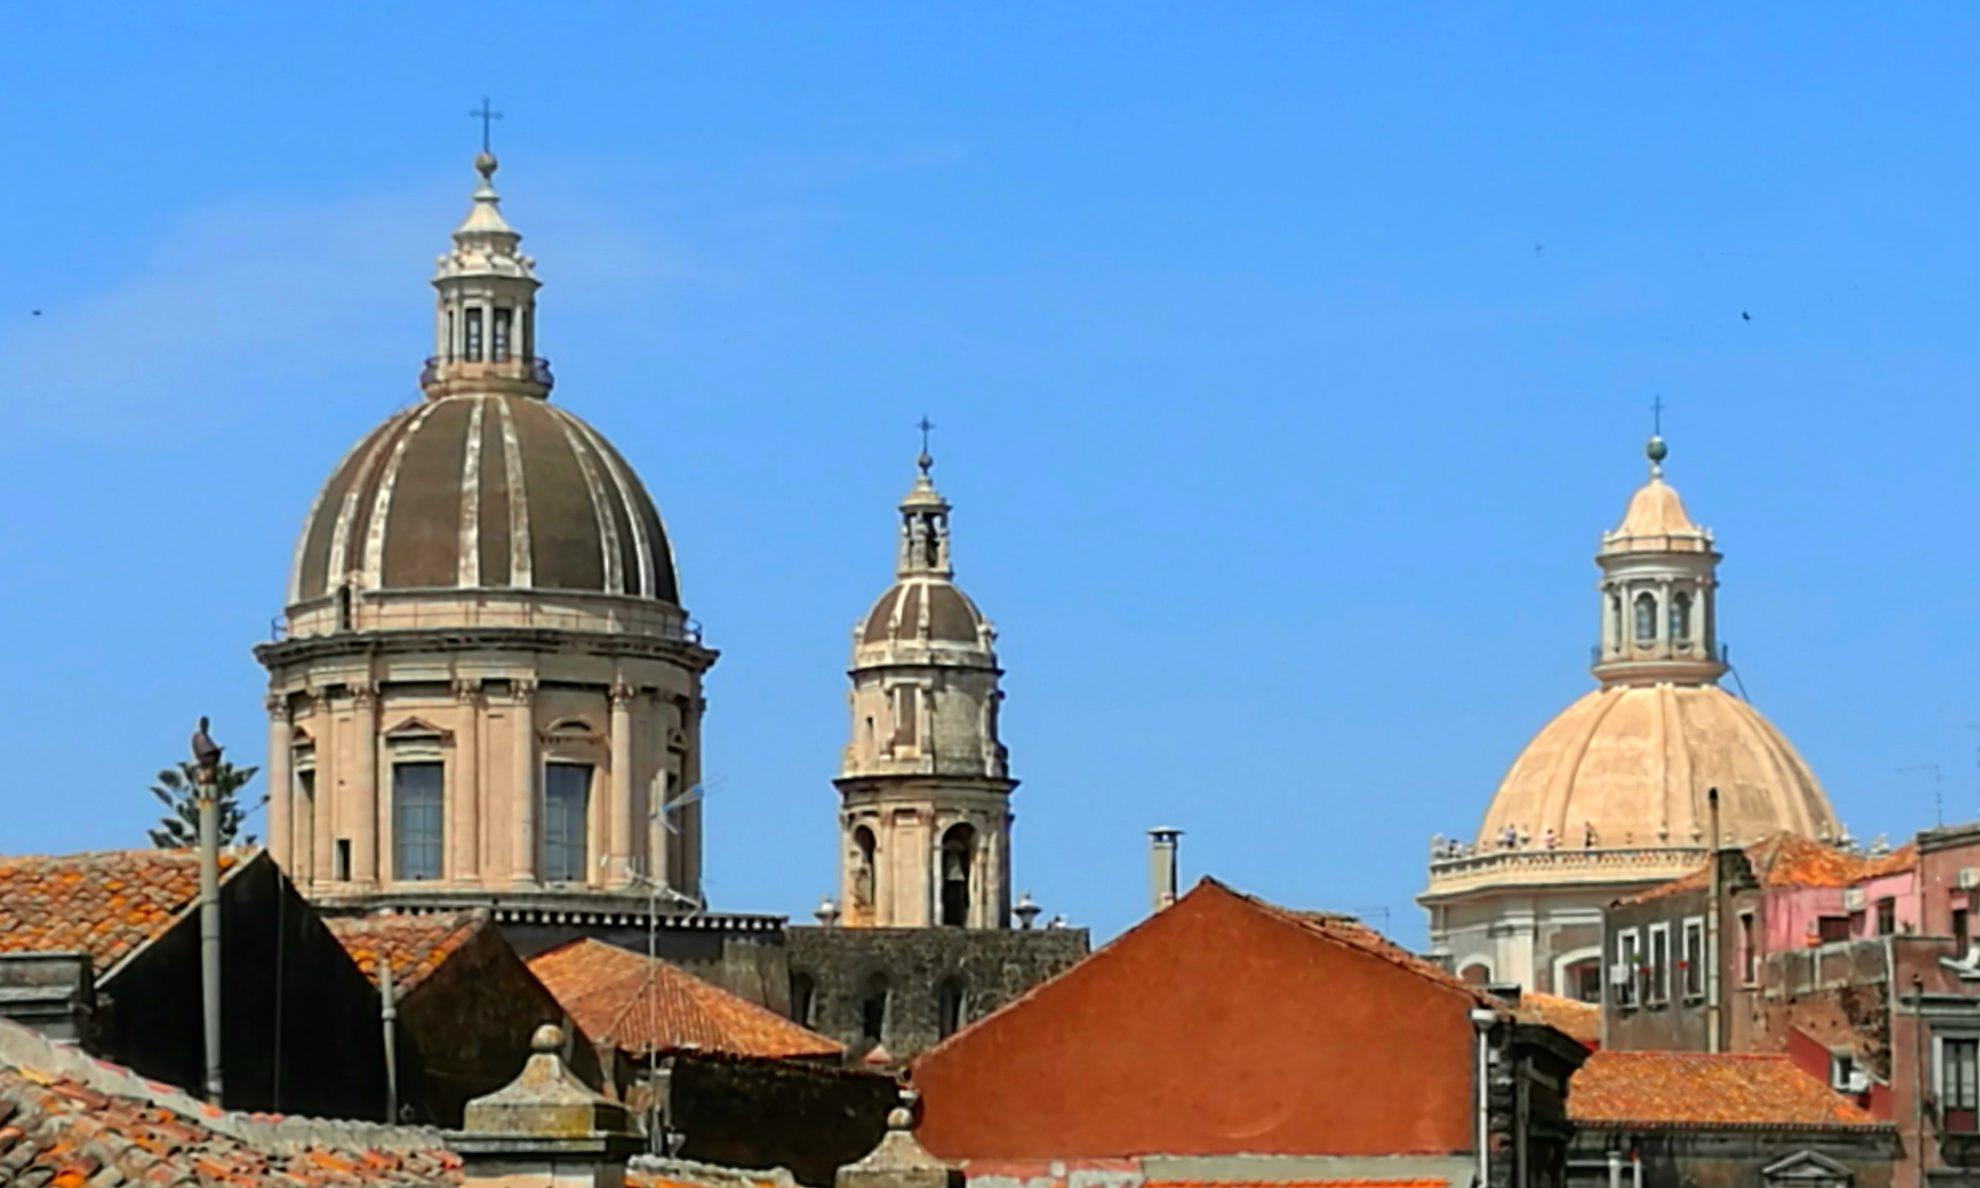 Вид на Кафедральный собор Святой Агаты (Cattedrale di Sant'Agata) в Катании. Он расположен на Соборной площади (piazza del Duomo) напротив известного фонтана Слон – символа города. Фото: А.Подколзин